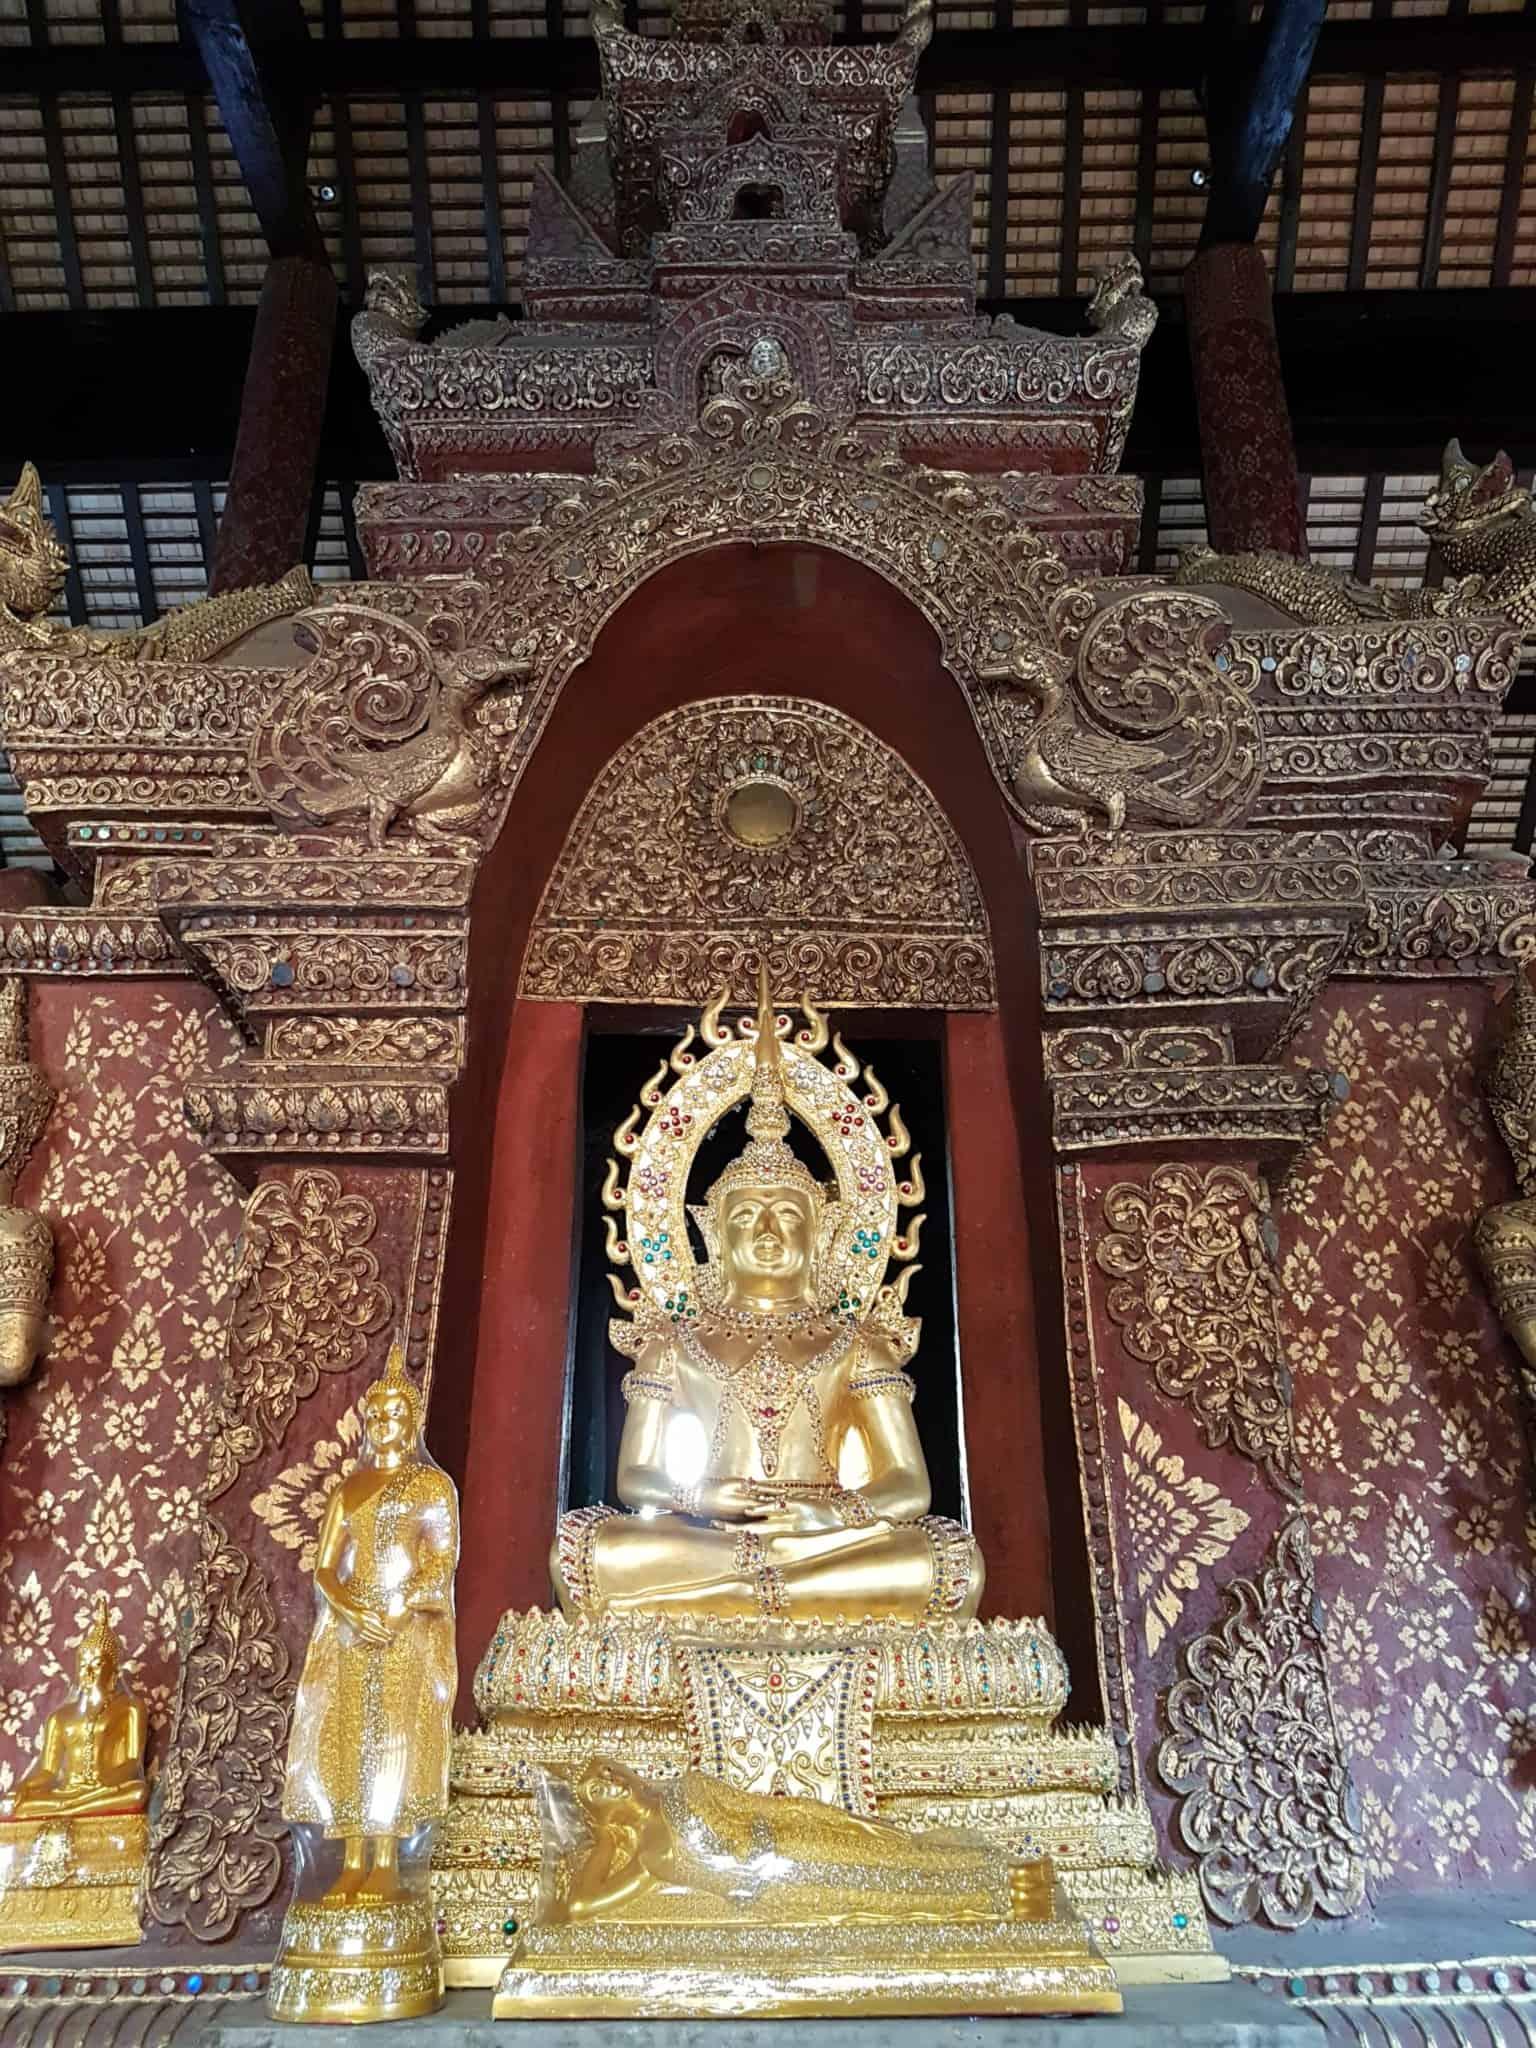 Thaïlande, on continue d'explorer Chiang Mai 👟 7